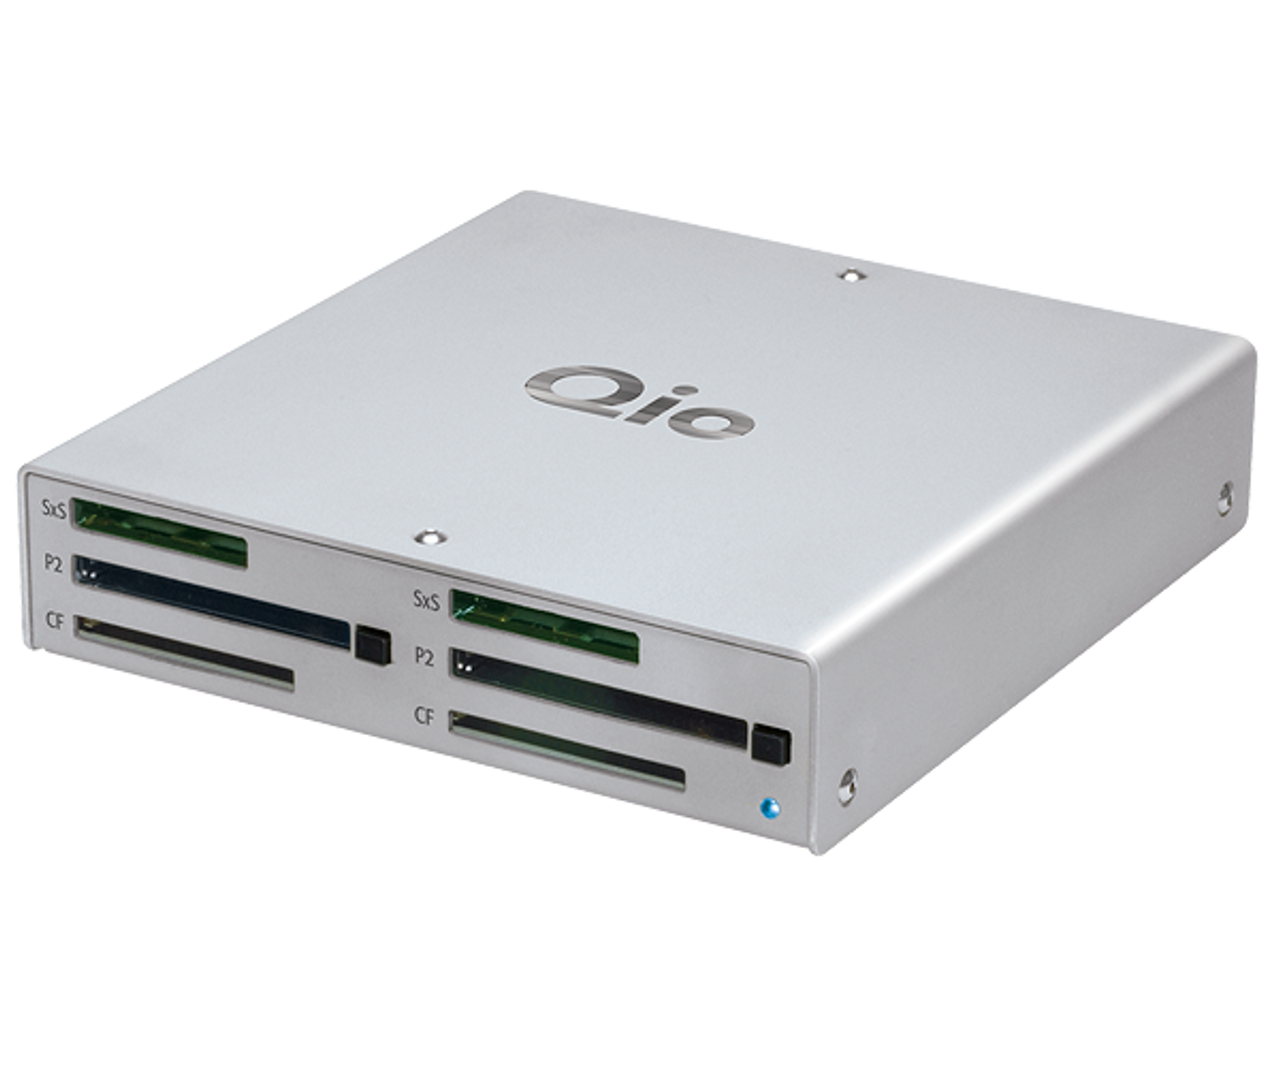 Sonnet Qio Universal Media Reader W/ PCIe Card For Windows